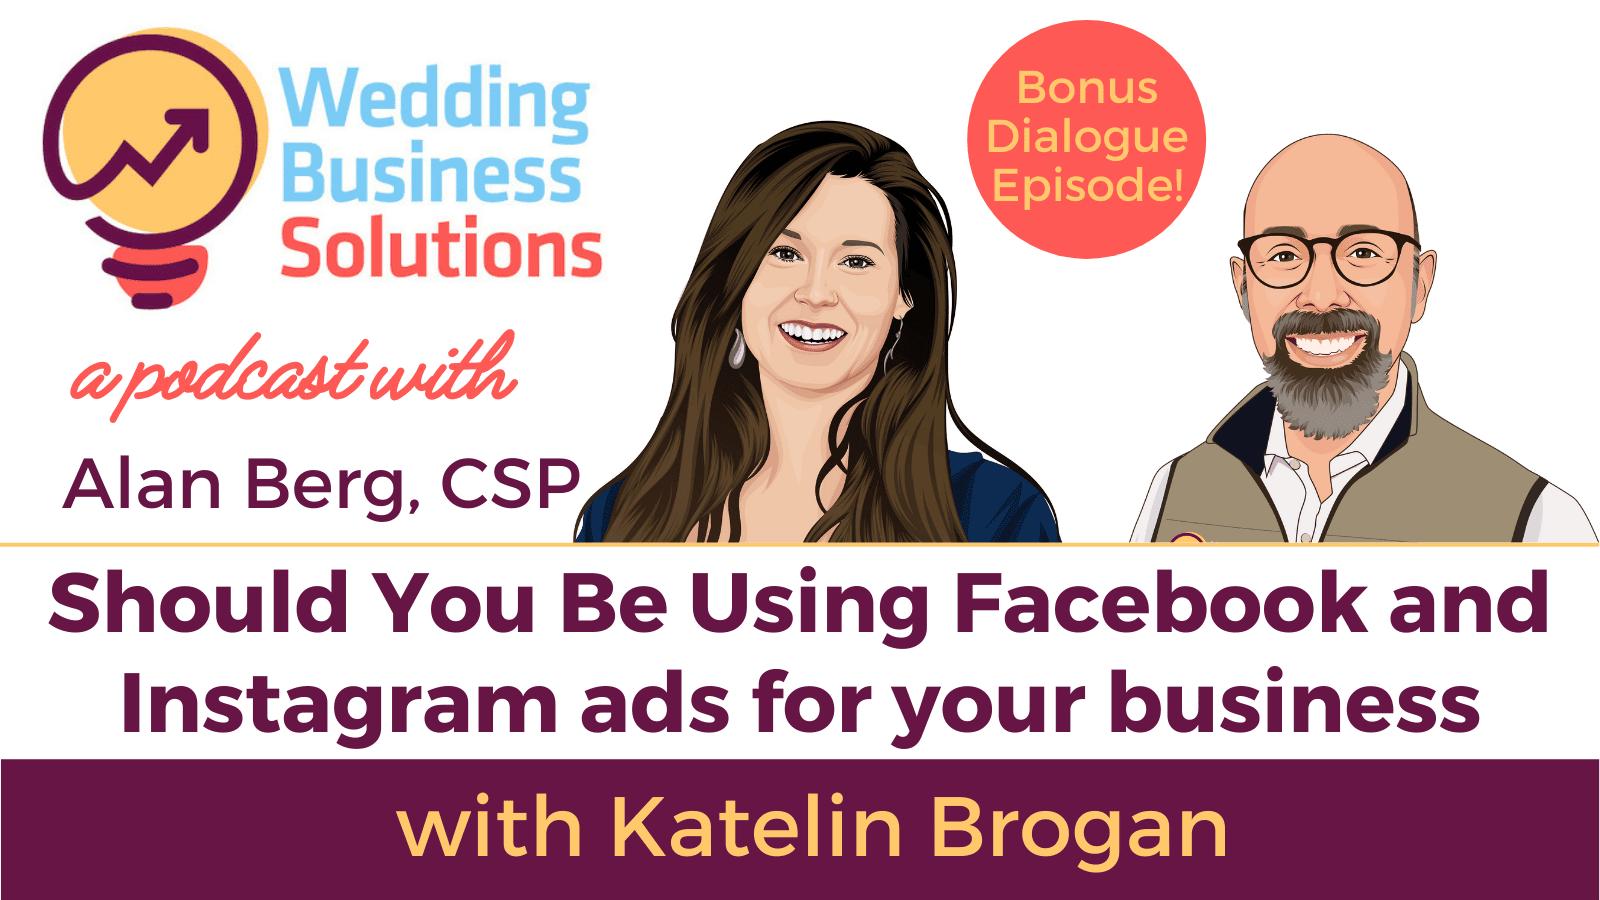 Wedding Business Solutions Podcast with Alan Berg CSP - Bonus Episode with Katelin Brogan